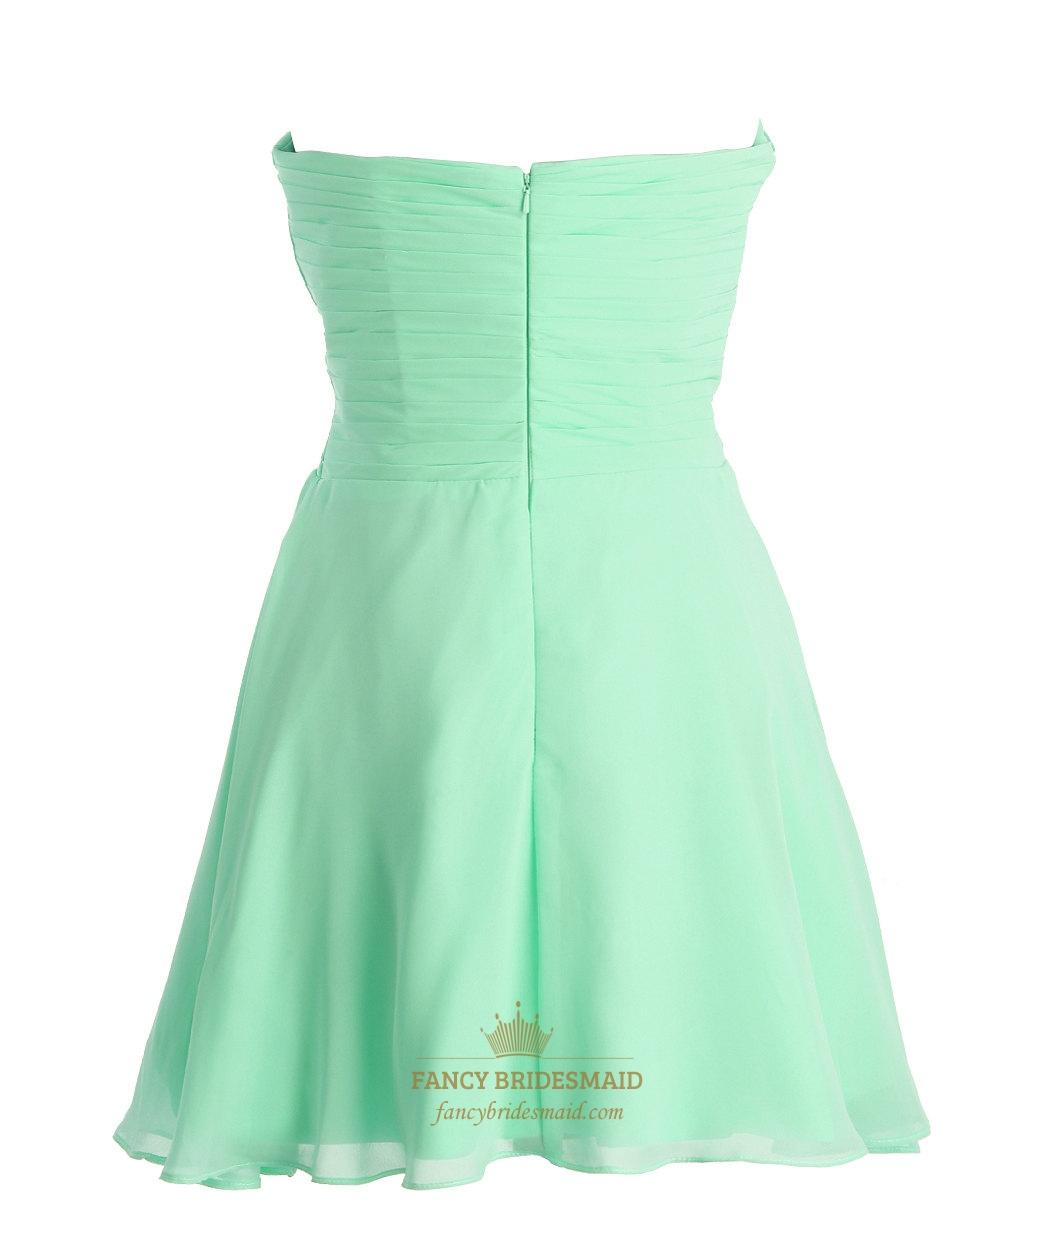 Short green chiffon bridesmaid dresses bridesmaid dresses for Short green wedding dresses